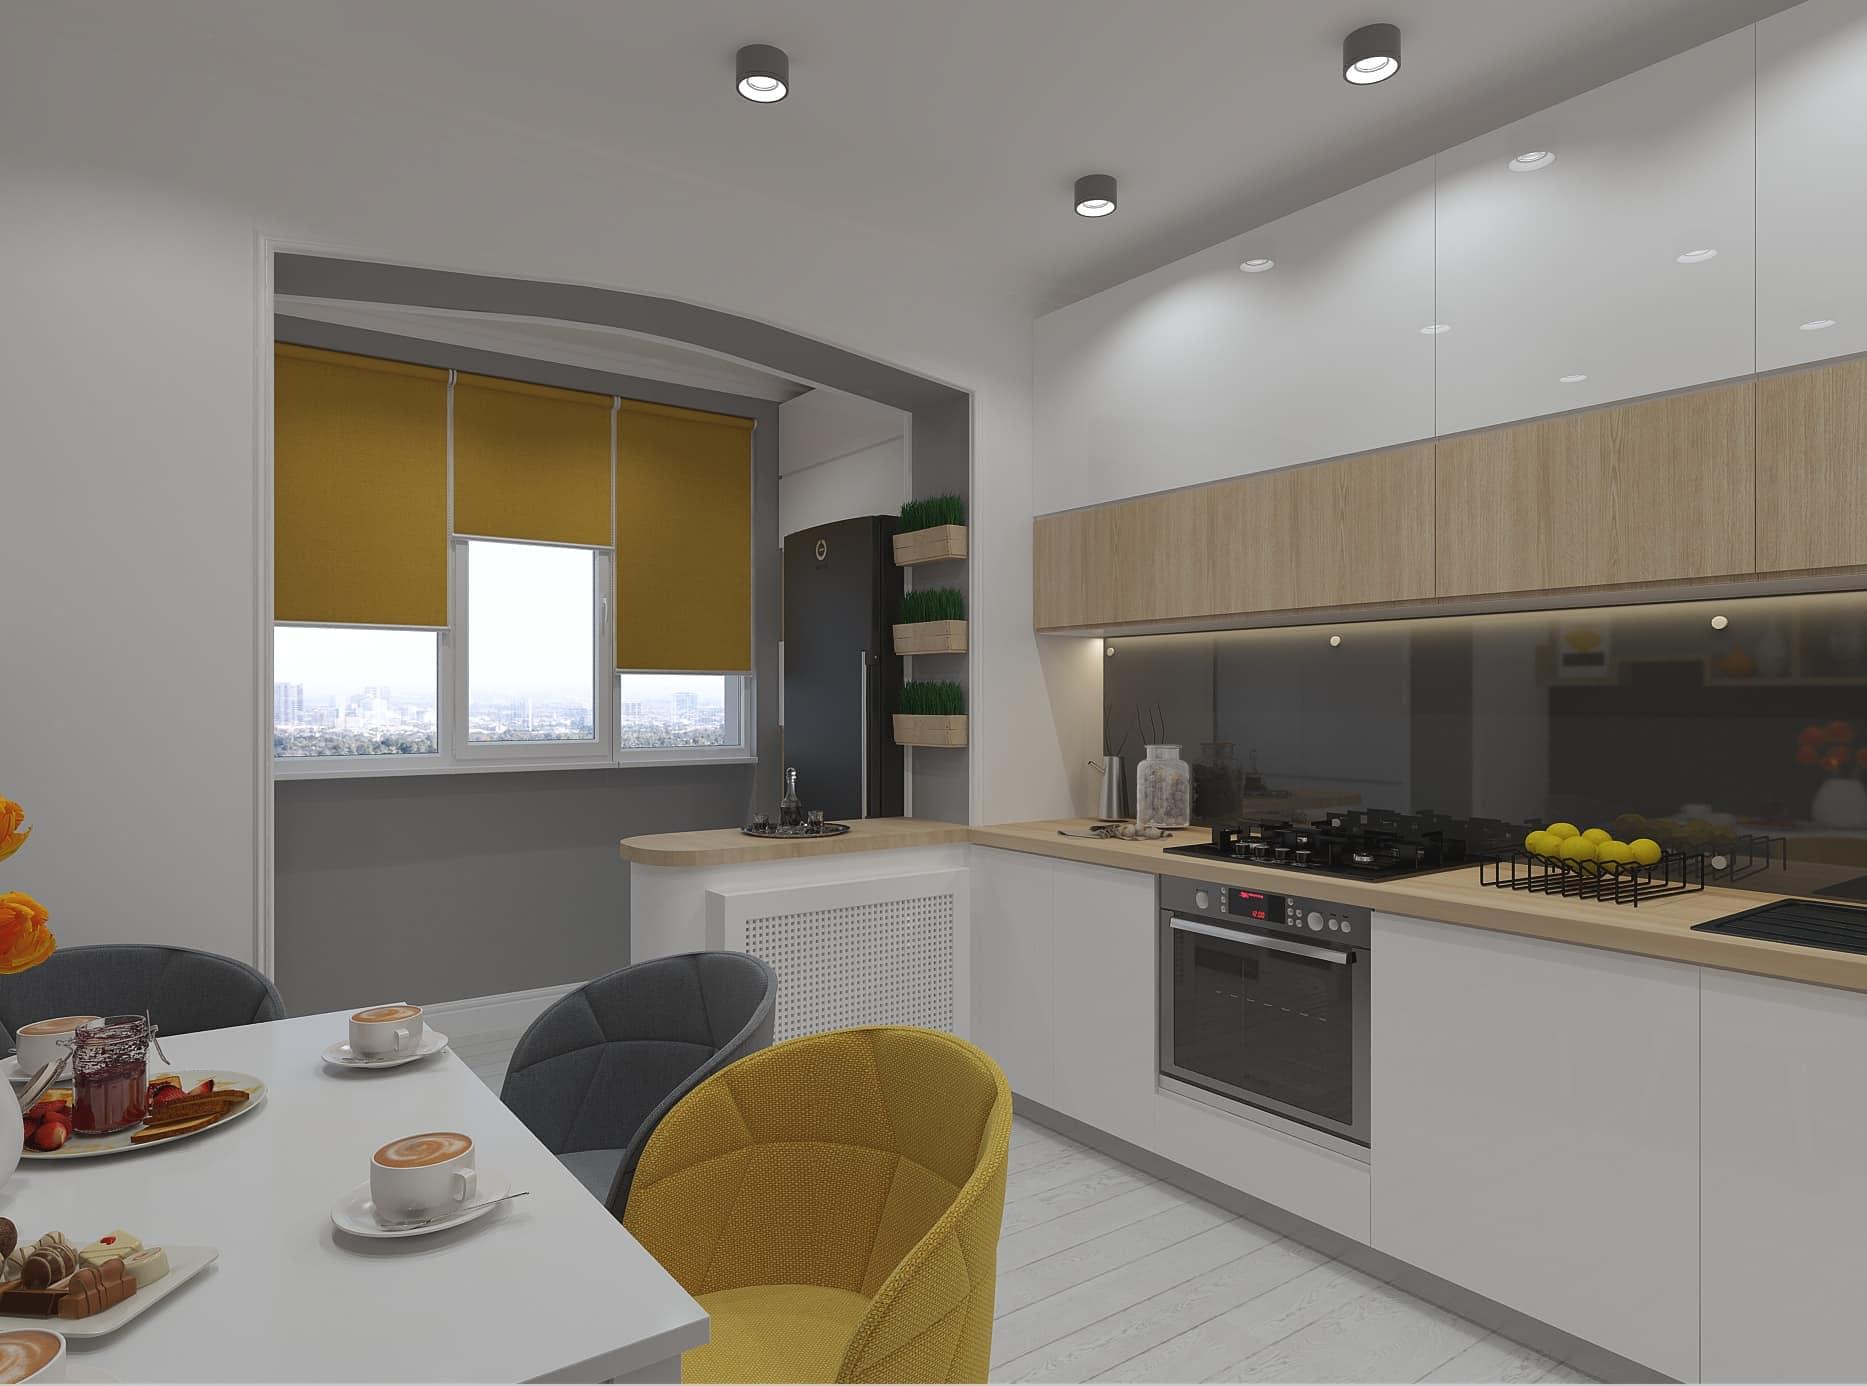 Дизайн кухні: фото 2